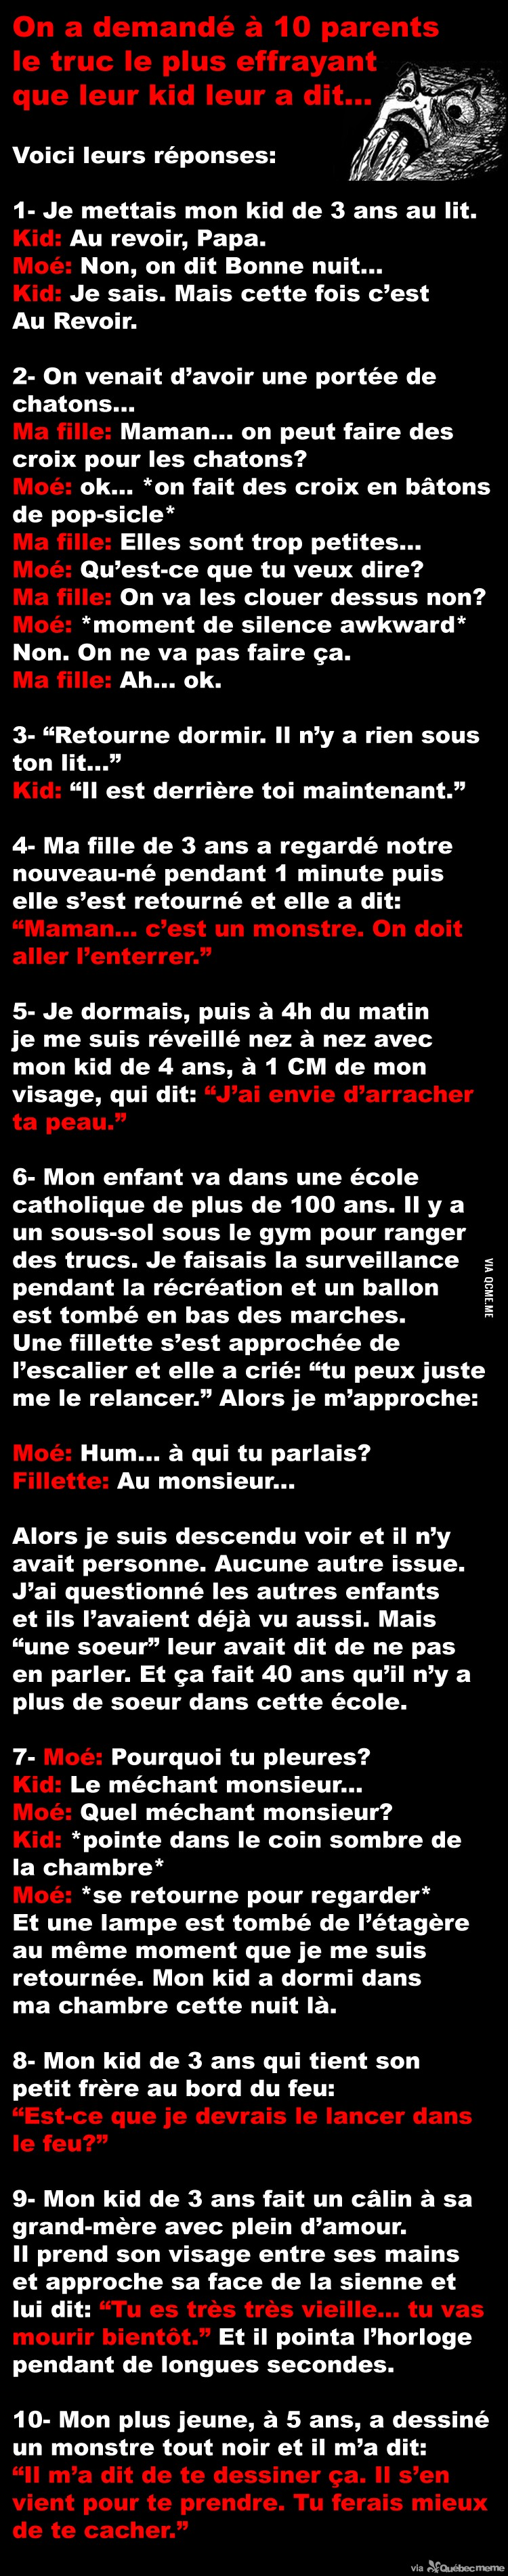 Paroles De Kids Effrayantes Québec Meme Autres Trucs